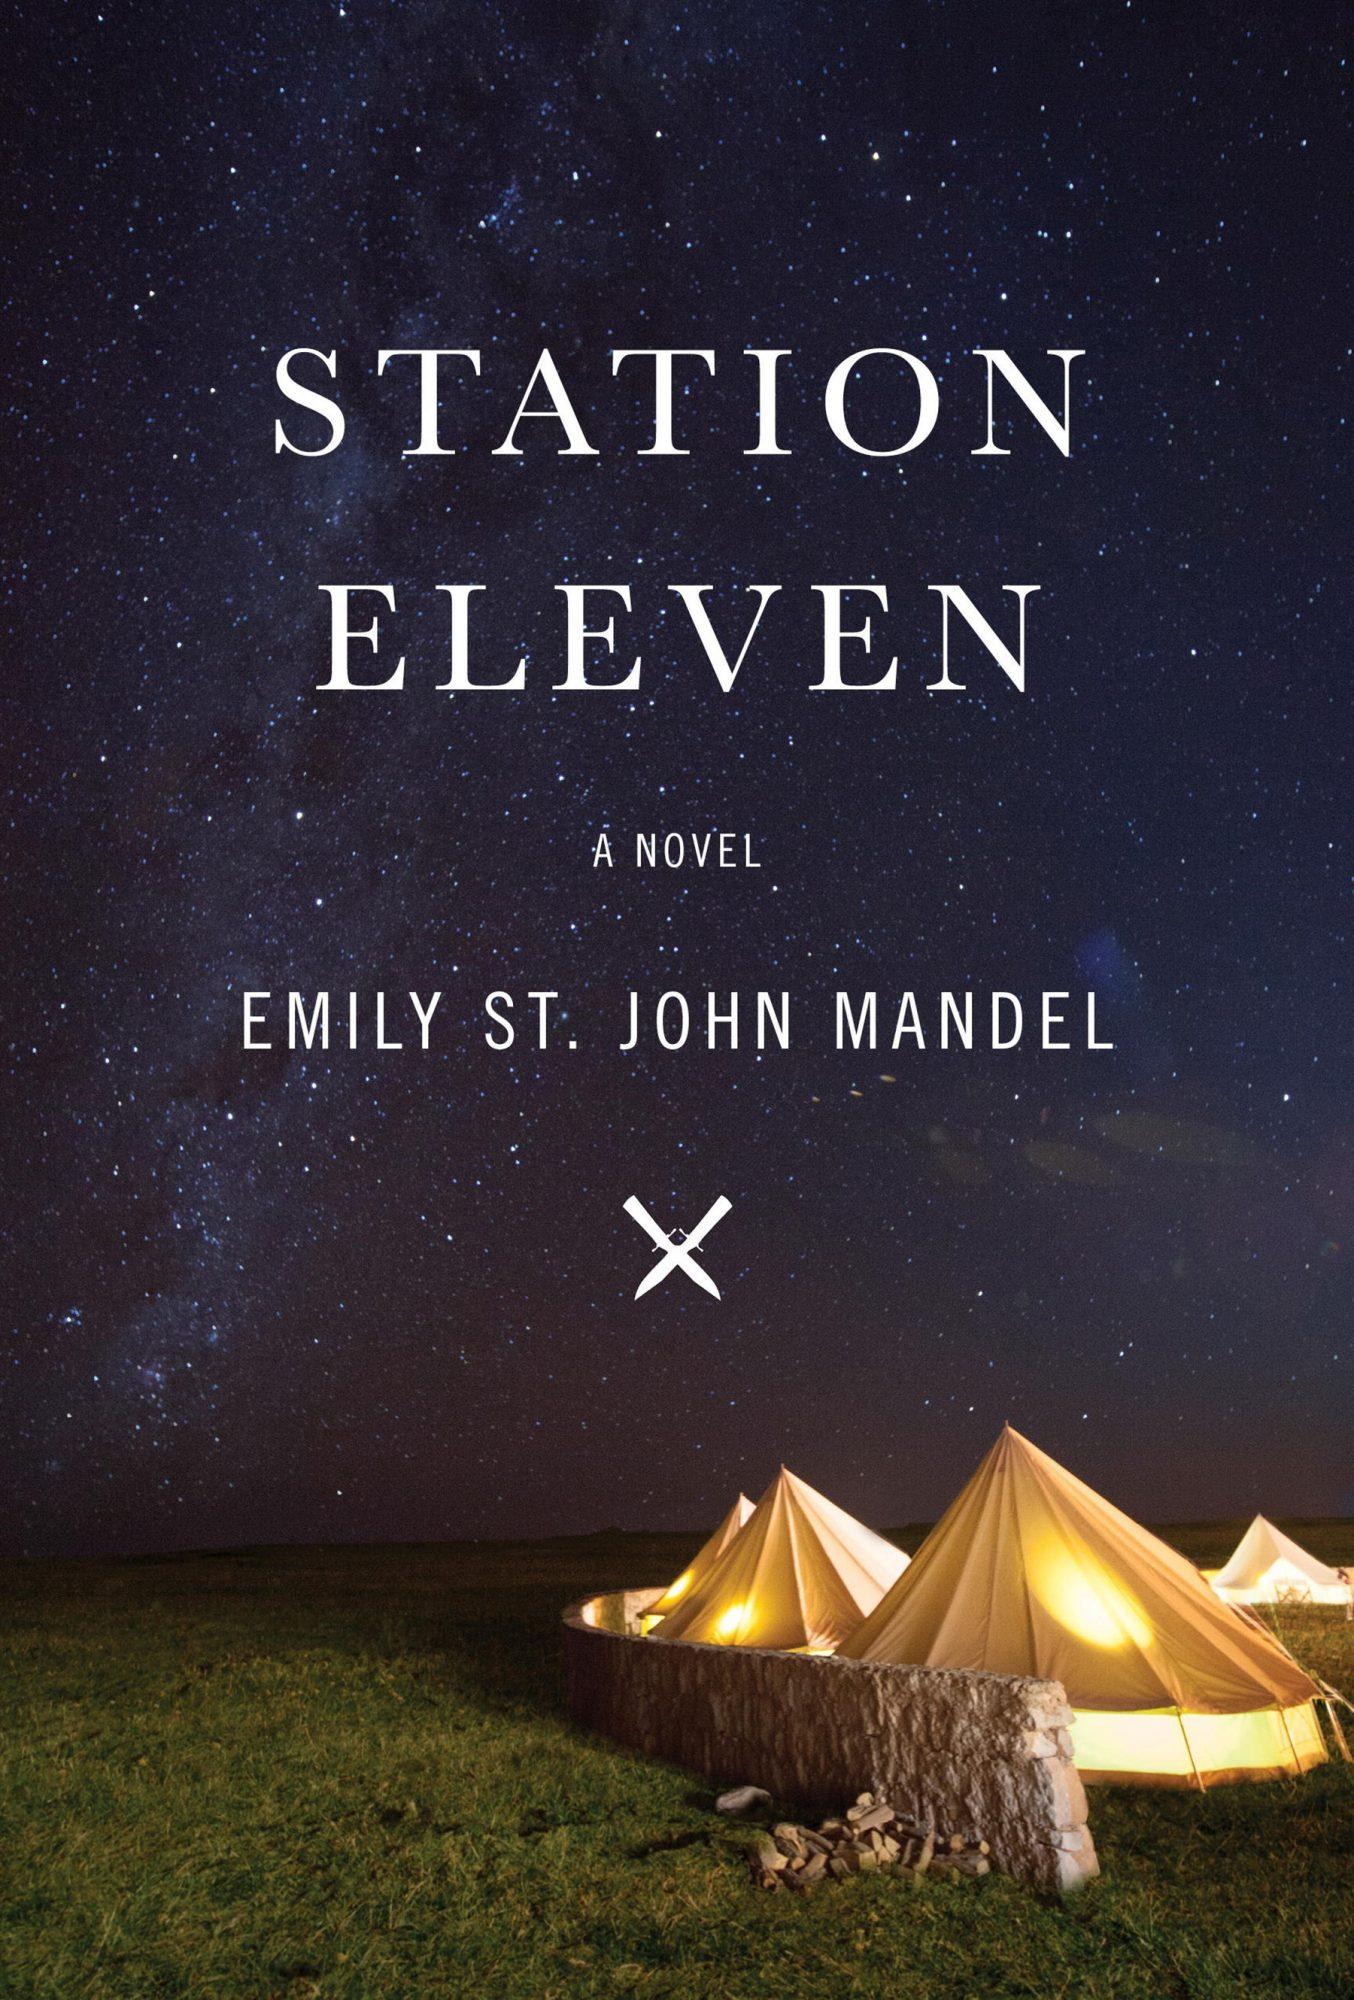 Station Eleven (9/9/14)By Emily St. John Mandel